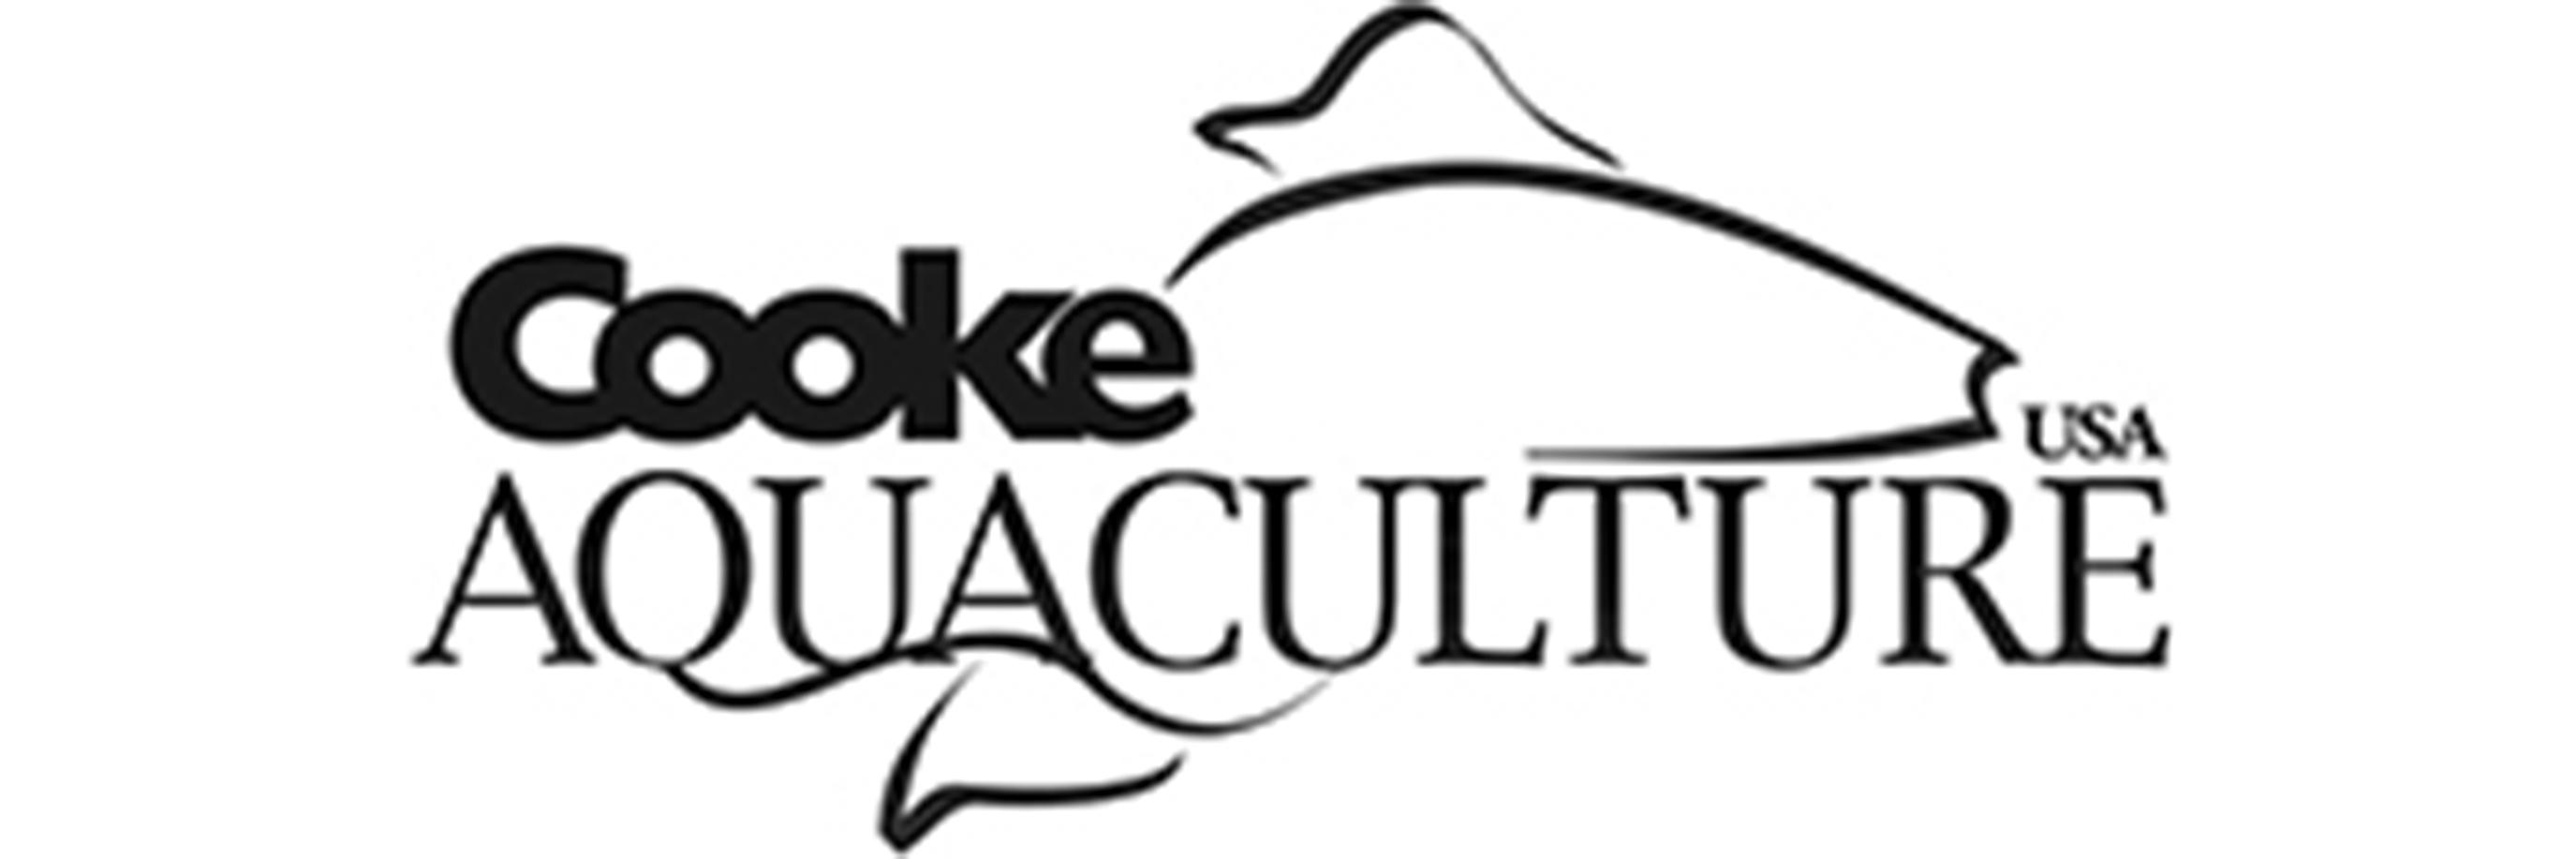 Aquaculture USA